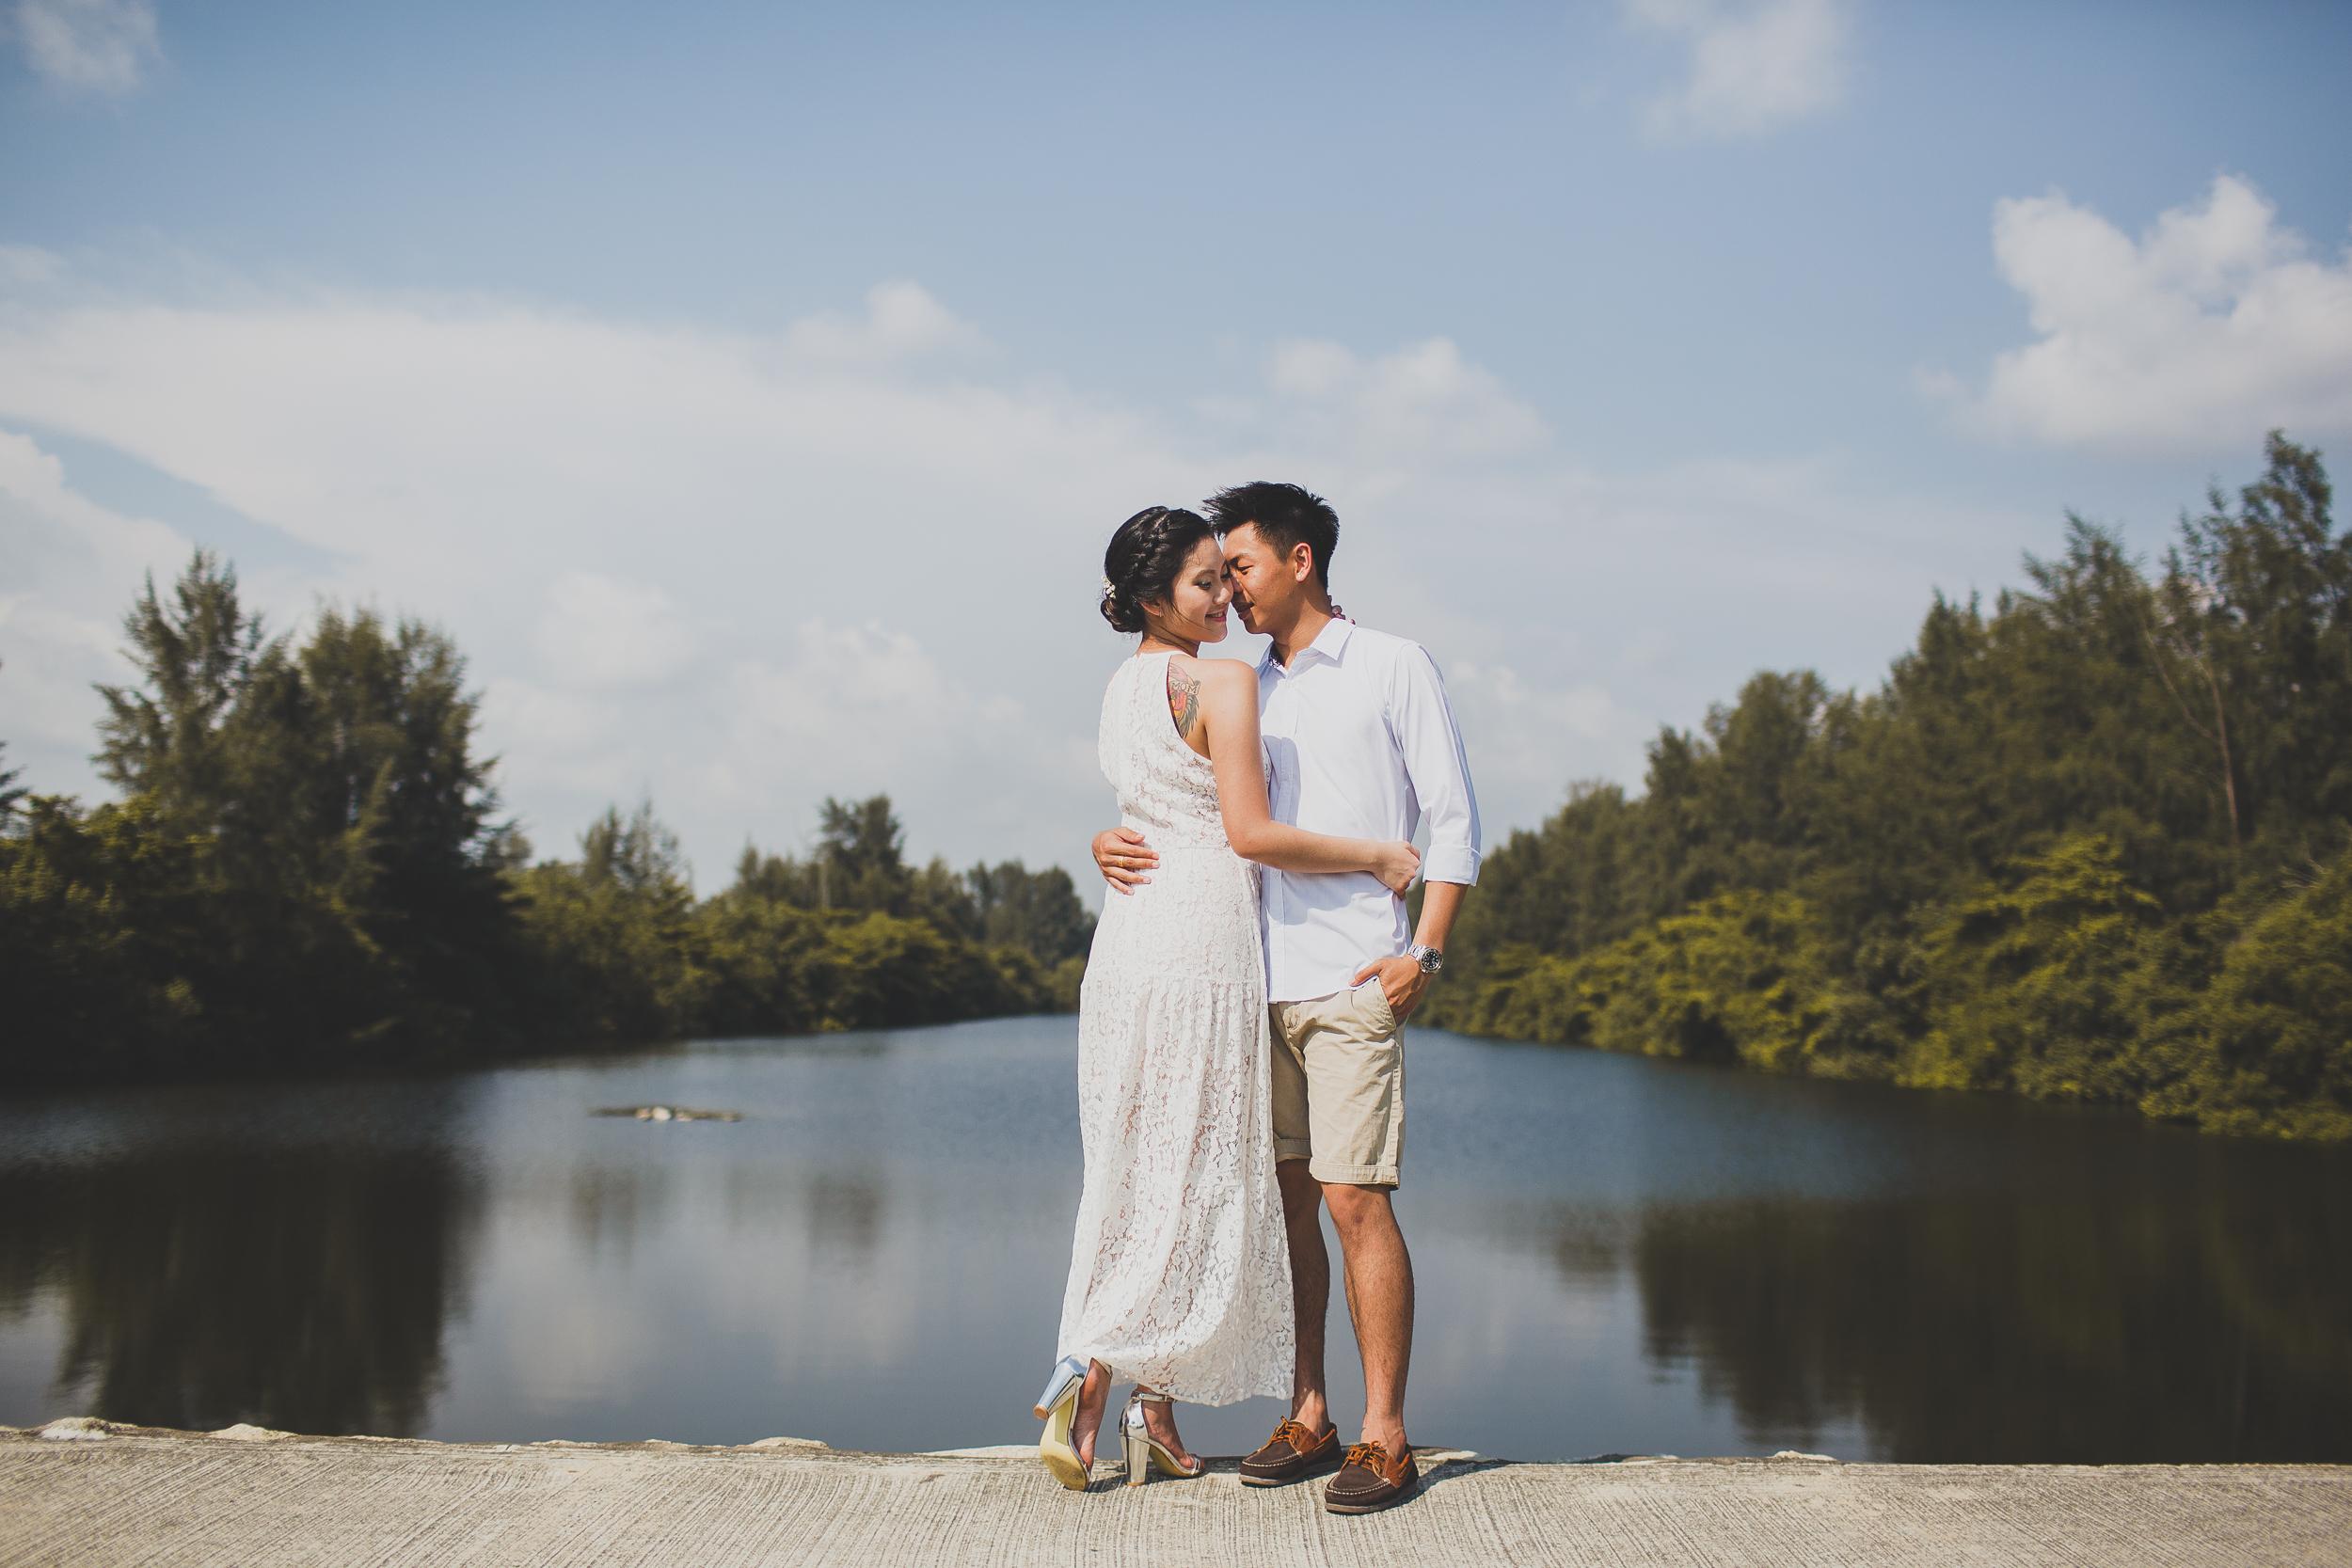 Singapore+Pre+Wedding+Photographer+Ziyang+Clara-0037.jpg